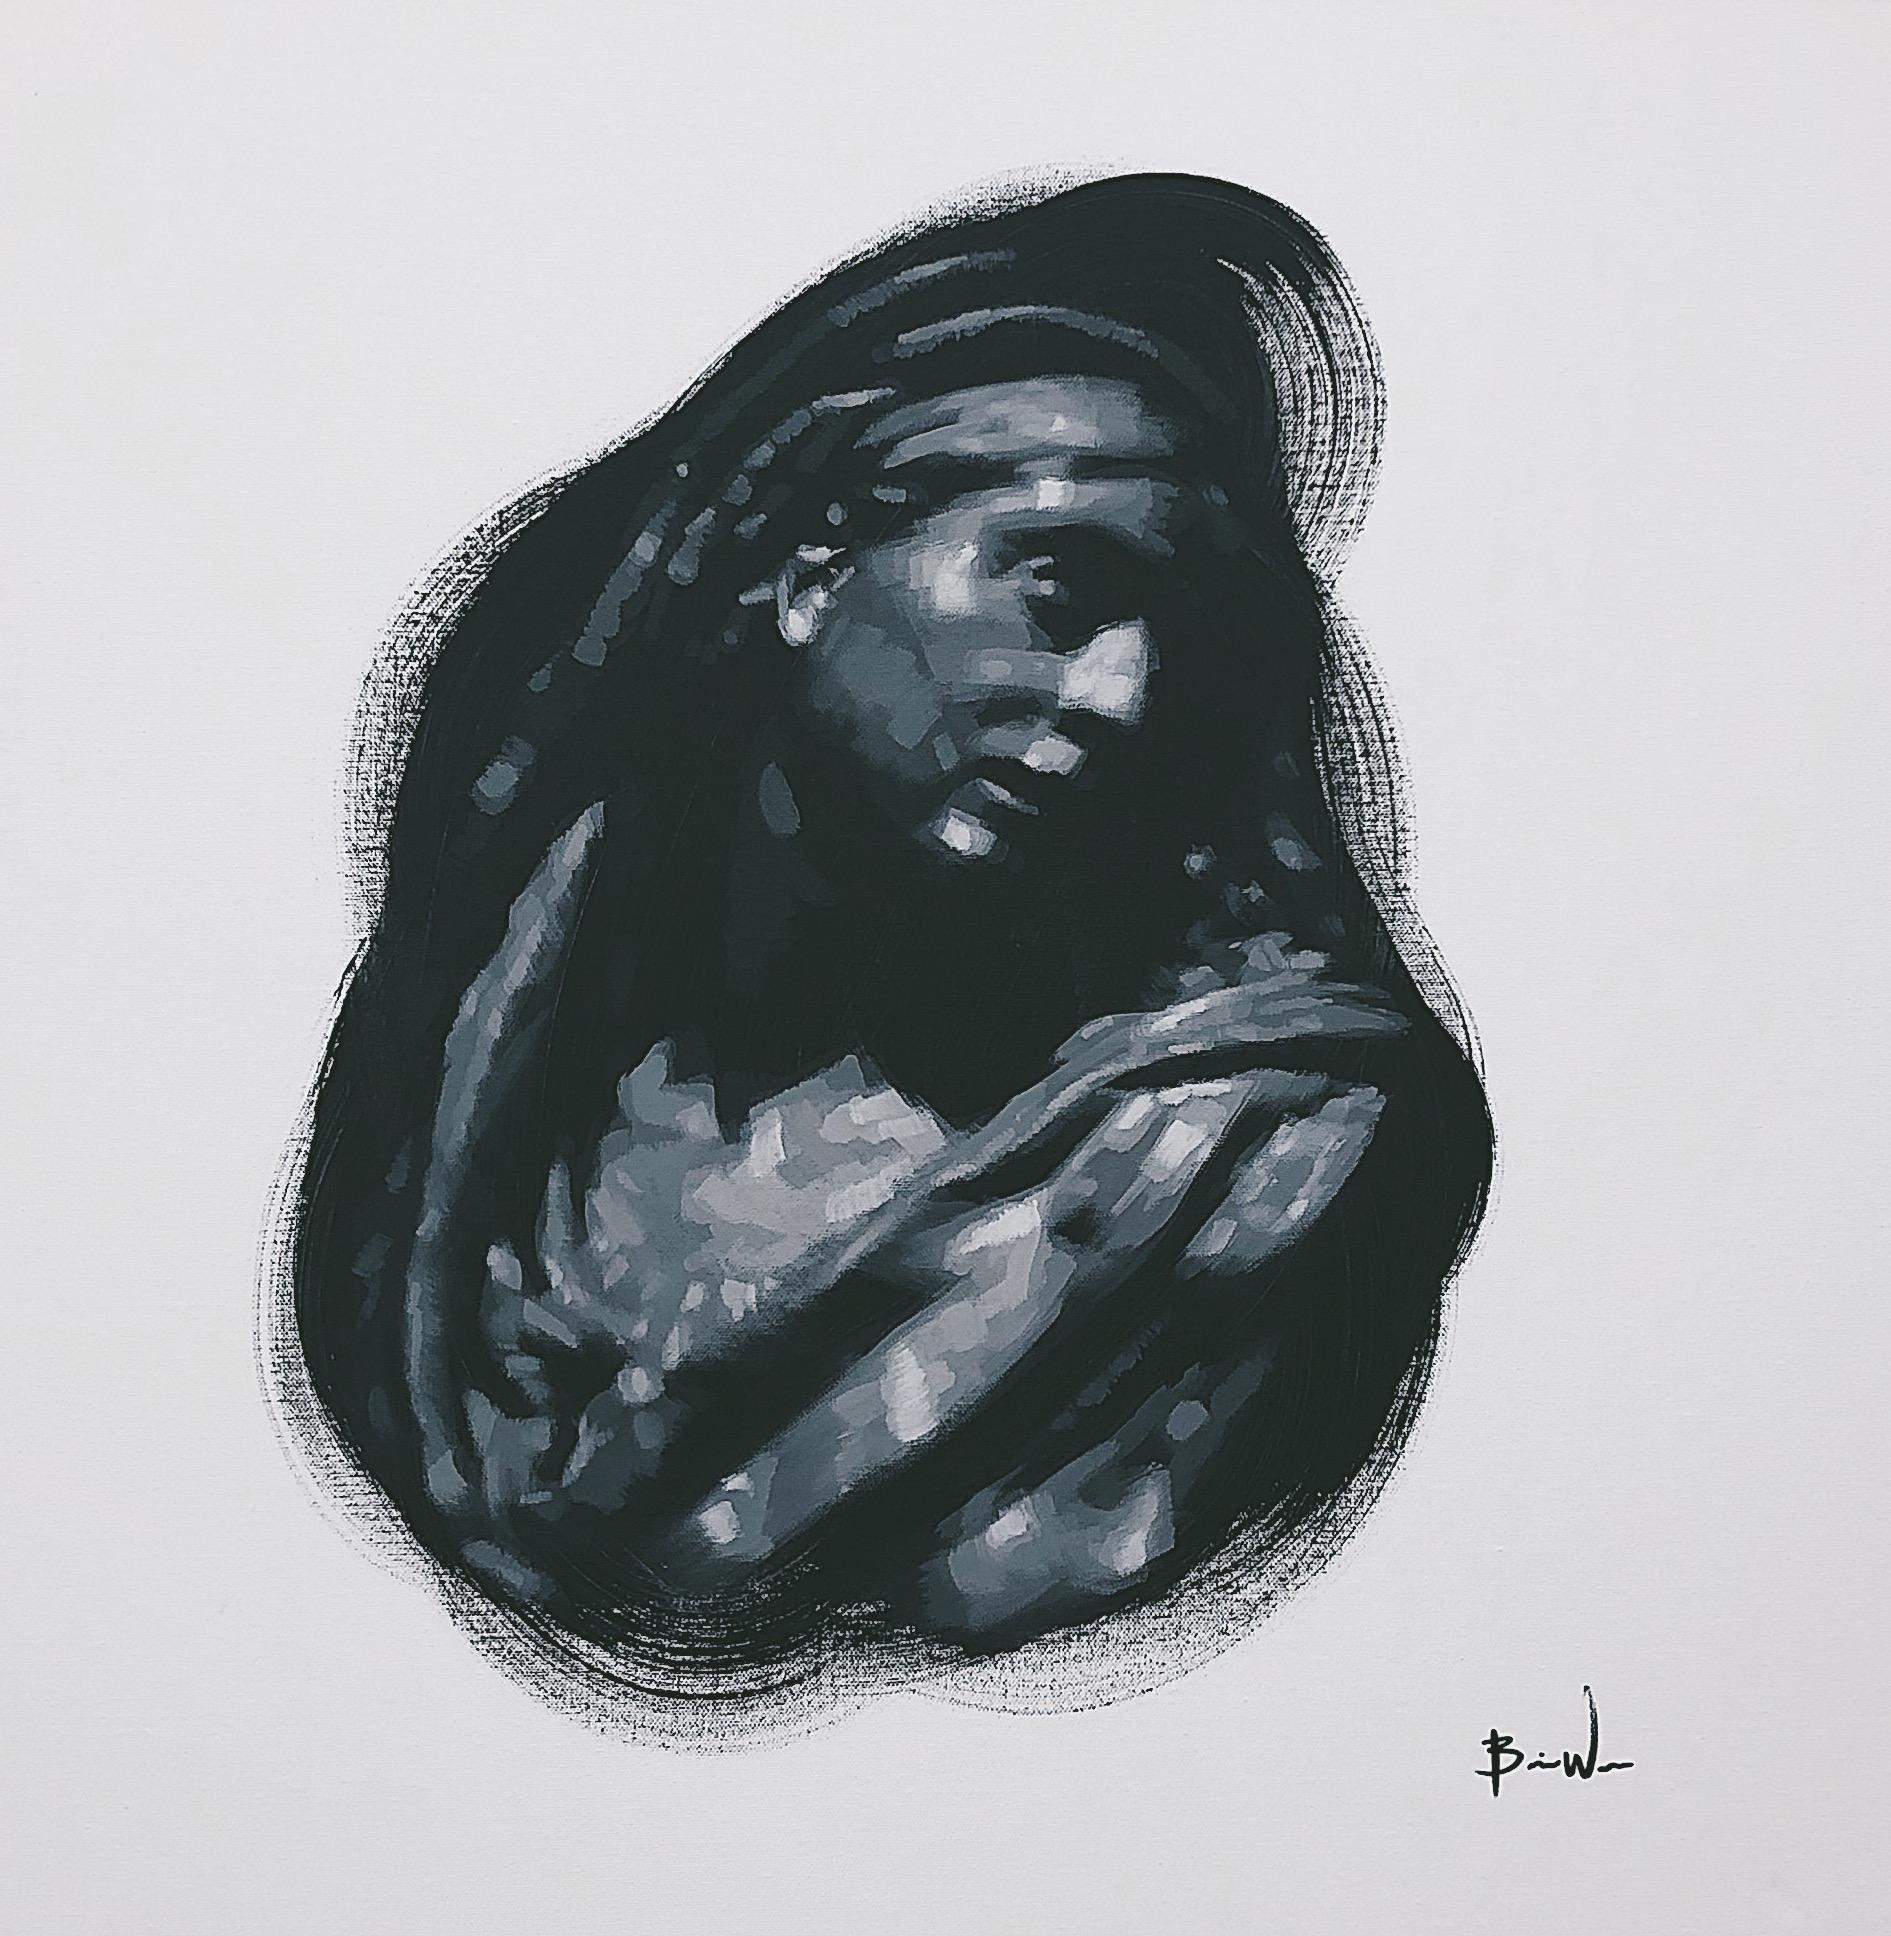 Image 2 - Brian Wooden Woman in Garment 2 12 x 12.JPG